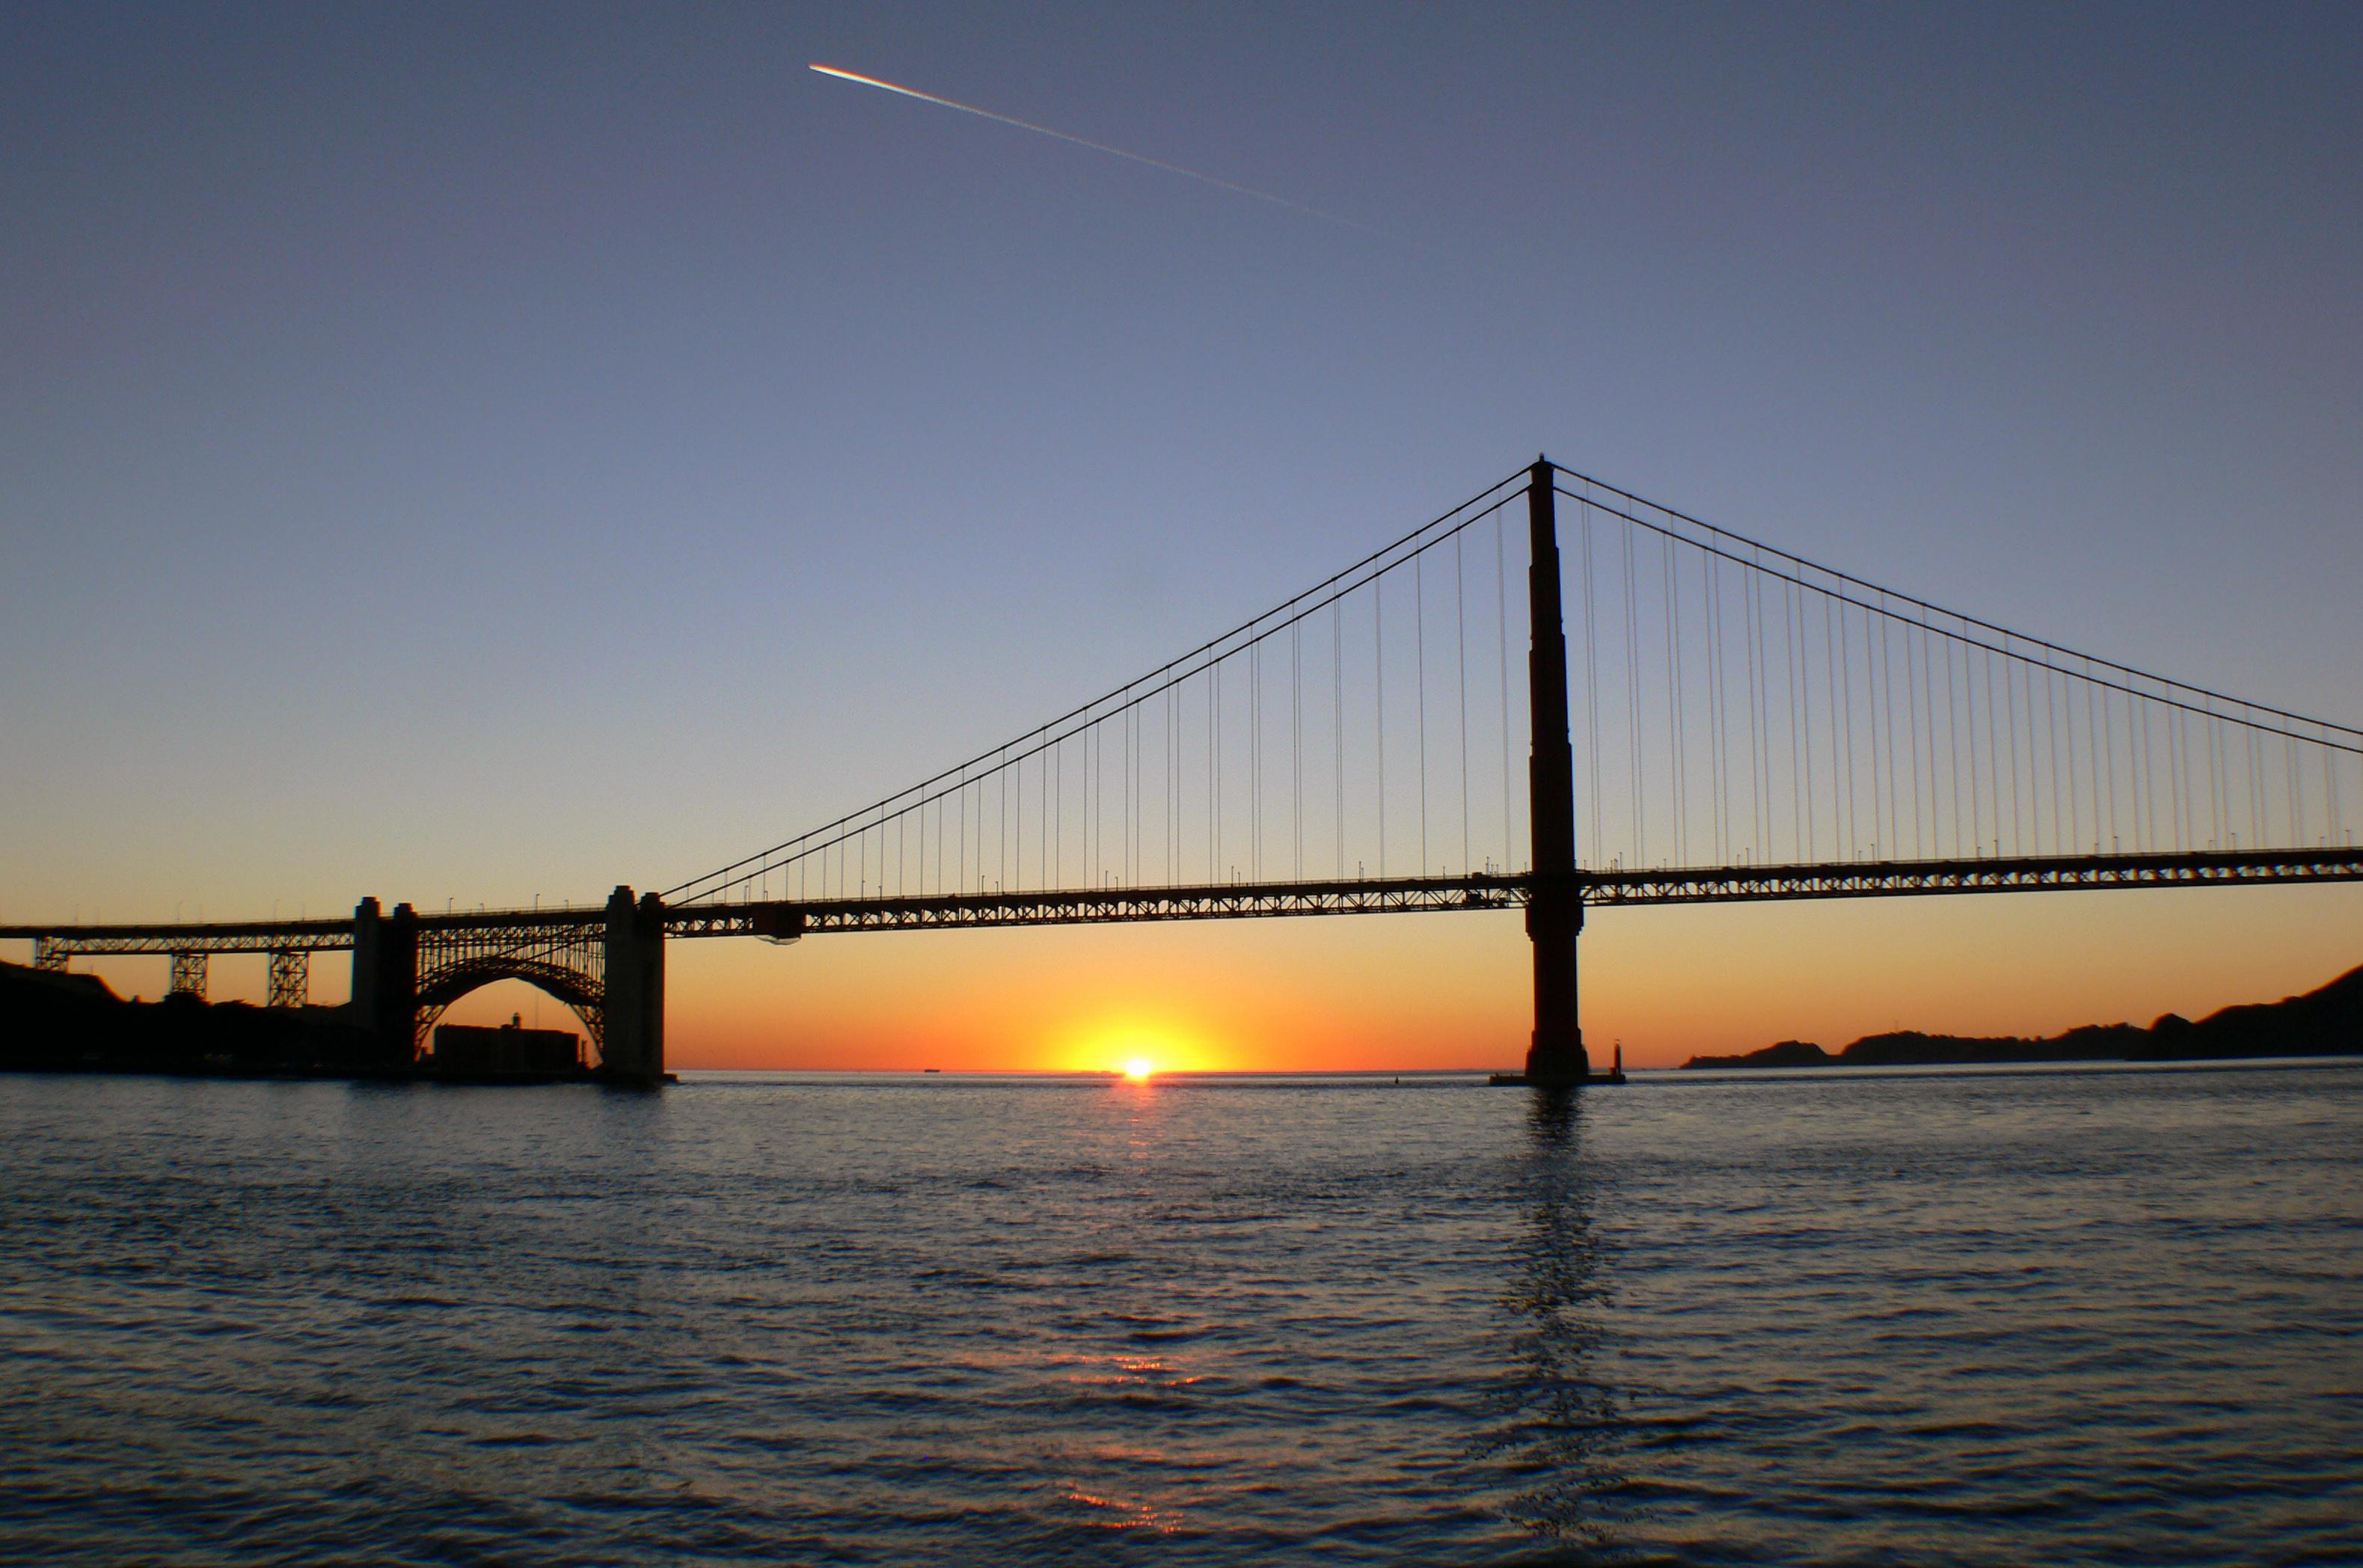 San francisco bay (21) photo